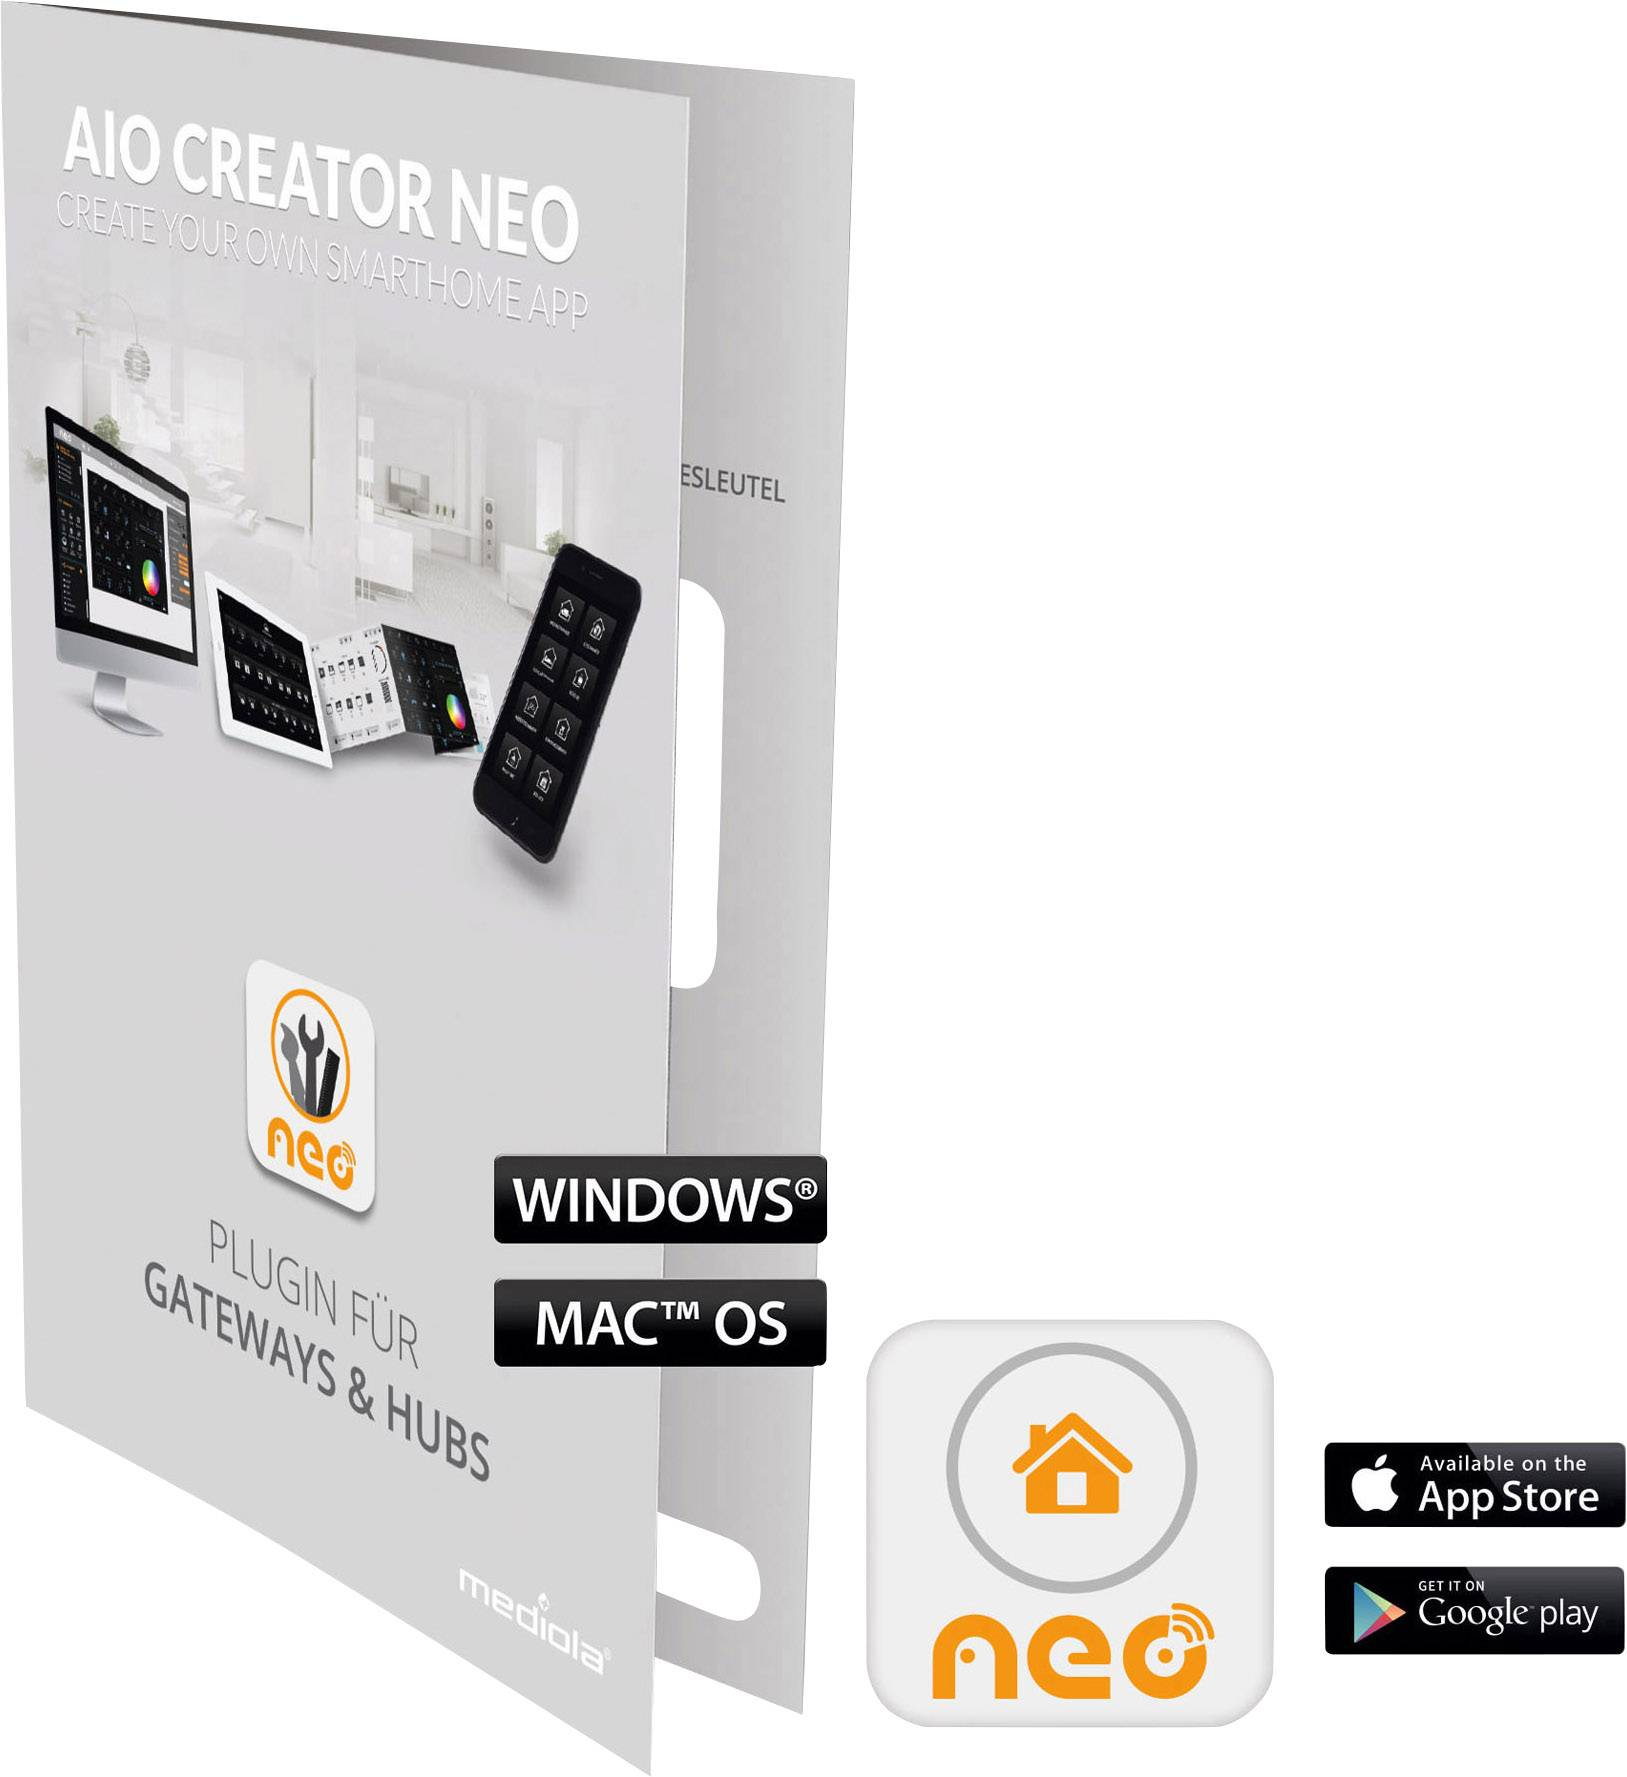 Doplňujúci software Mediola SUM-4129-b AIO CREATOR NEO Intertechno ITGW-433